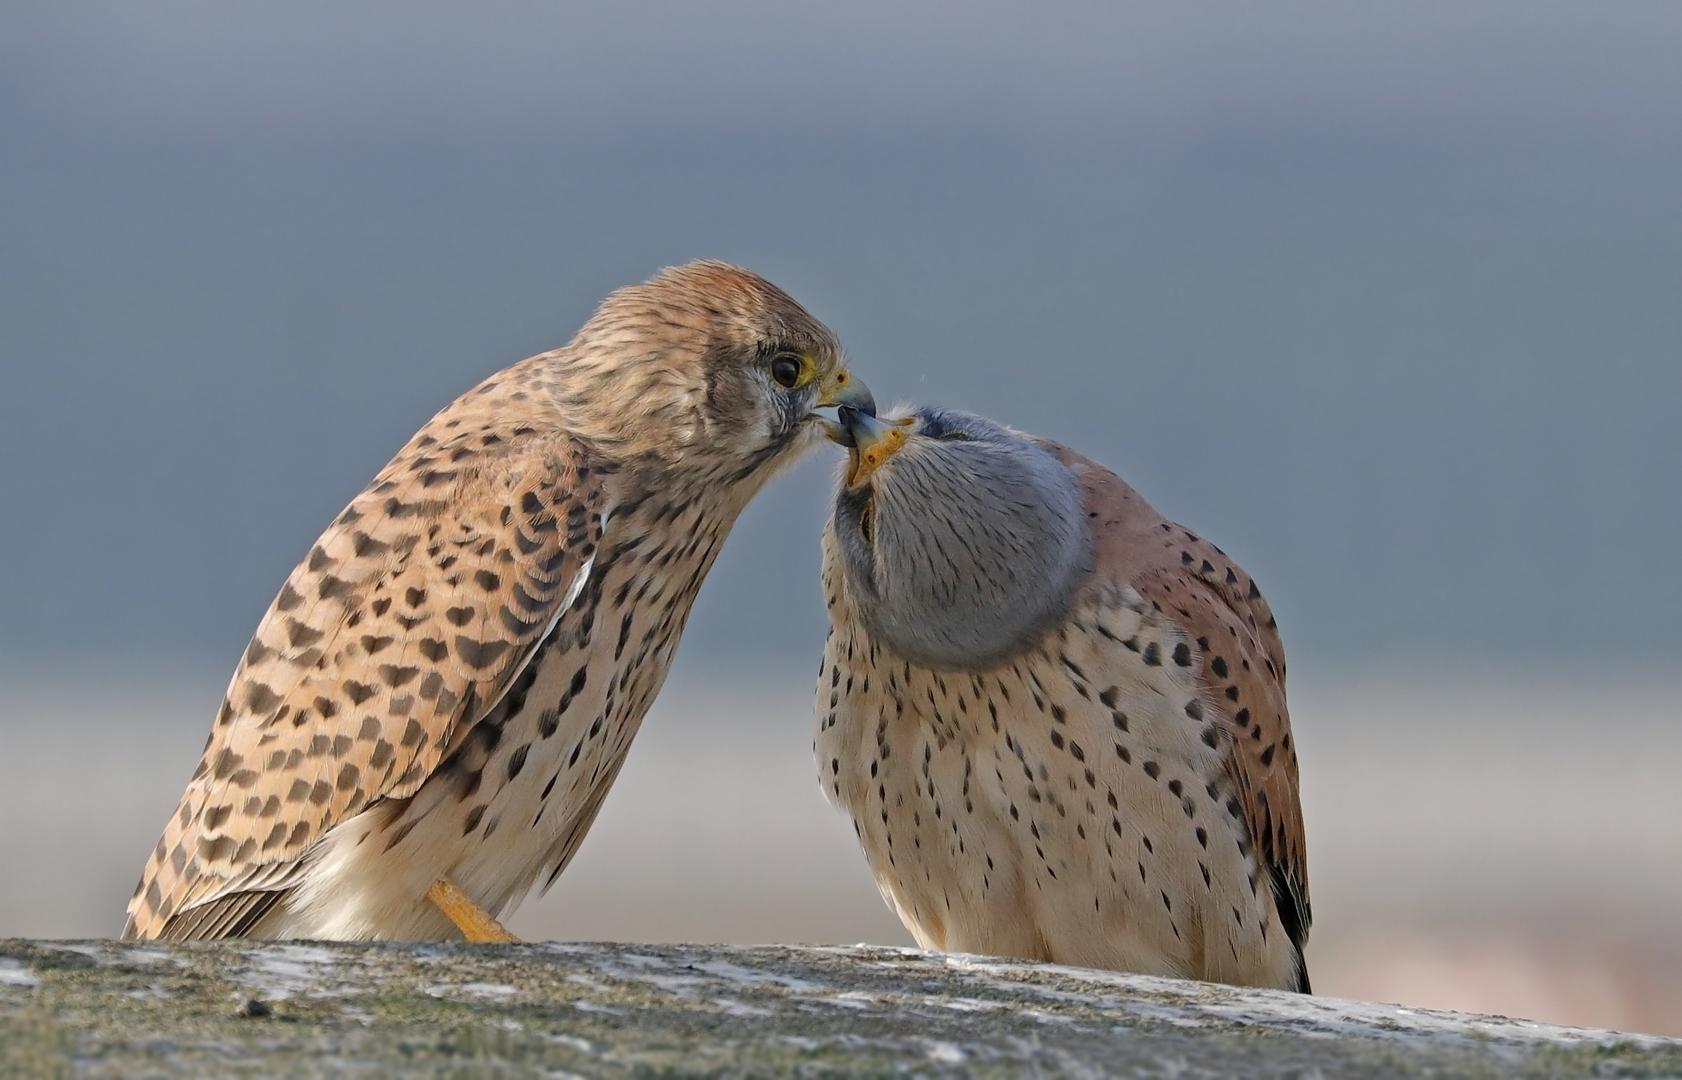 Der Kuss der Turmfalken- Falco tinnunculus- Turmfalkenpaar